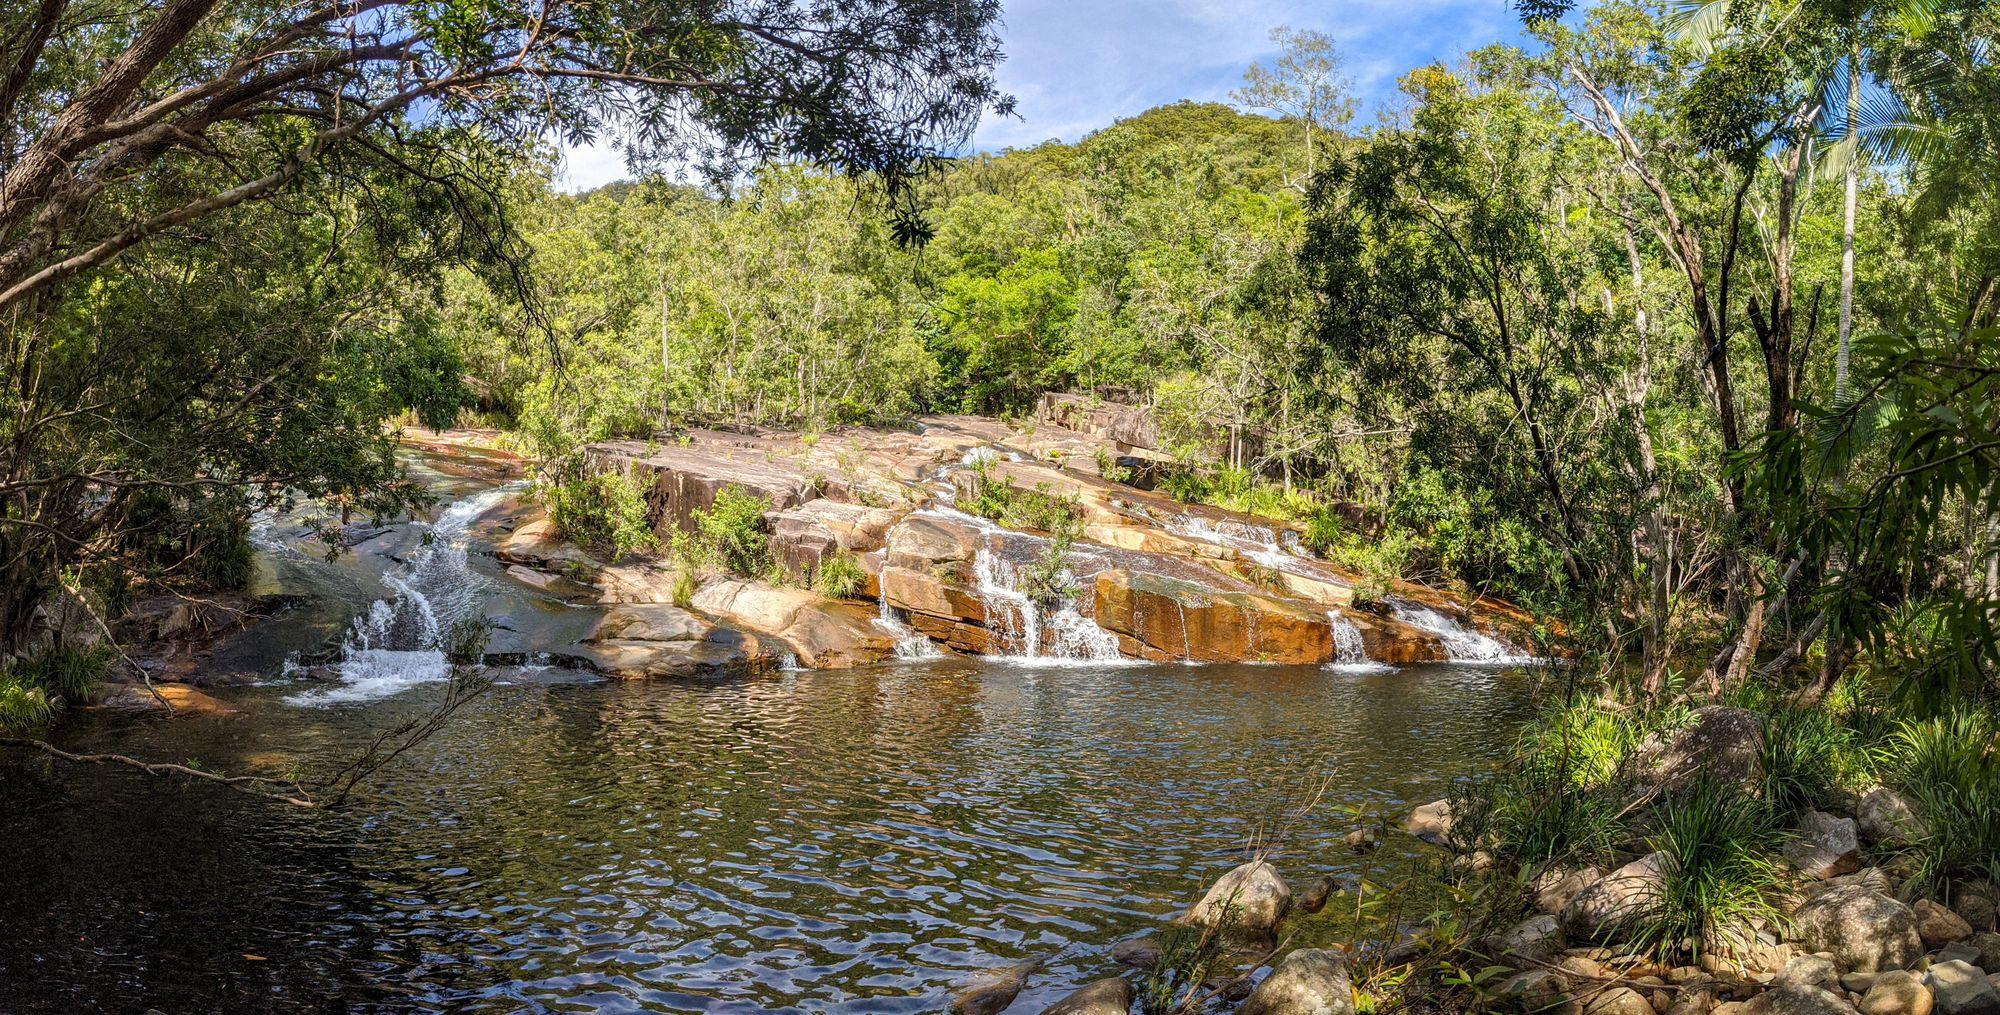 plam creek rockslides pool